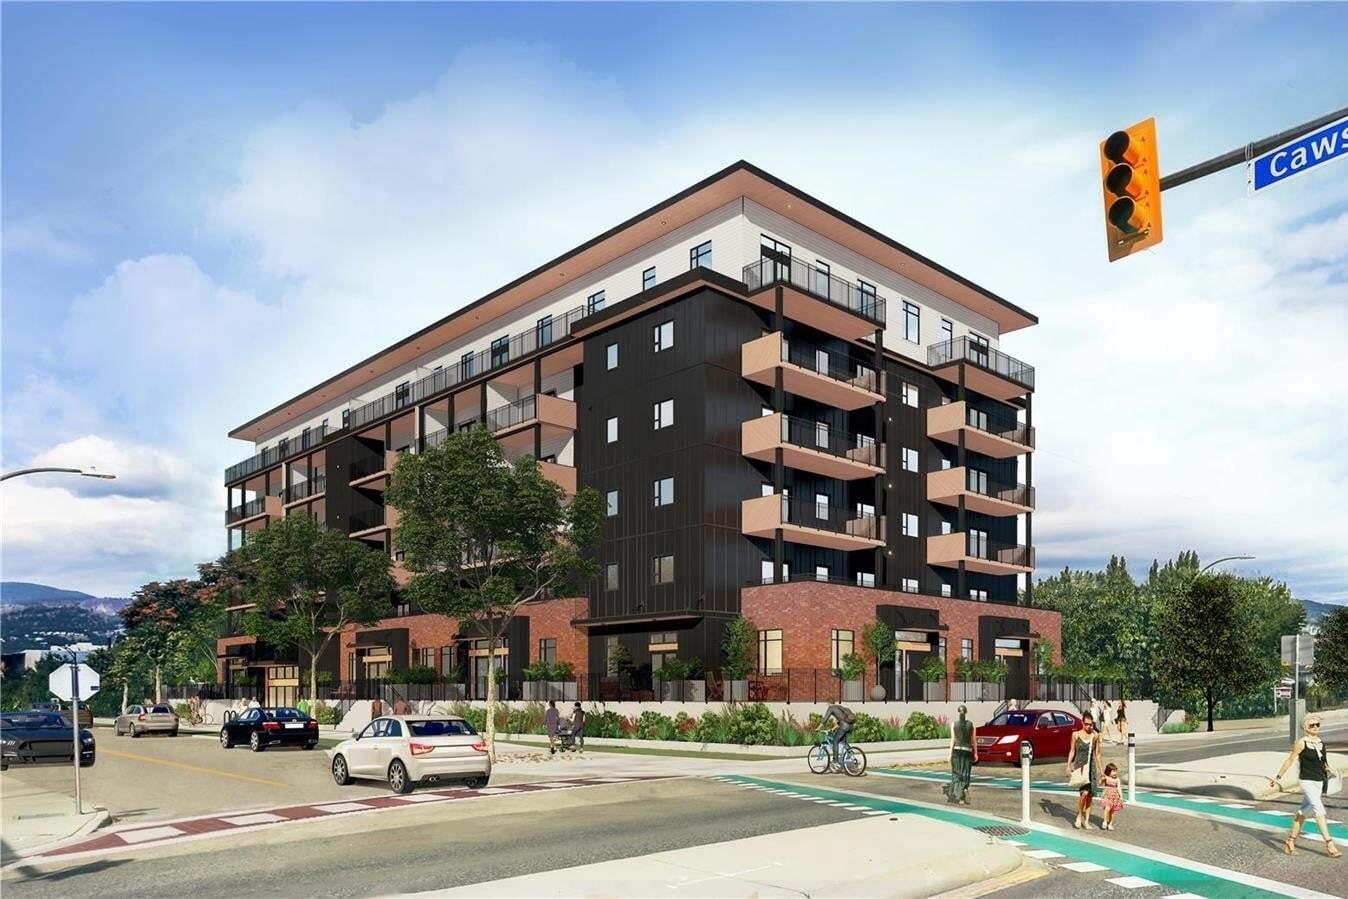 Condo for sale at 660 Cawston Ave North Unit 208 Kelowna British Columbia - MLS: 10214120